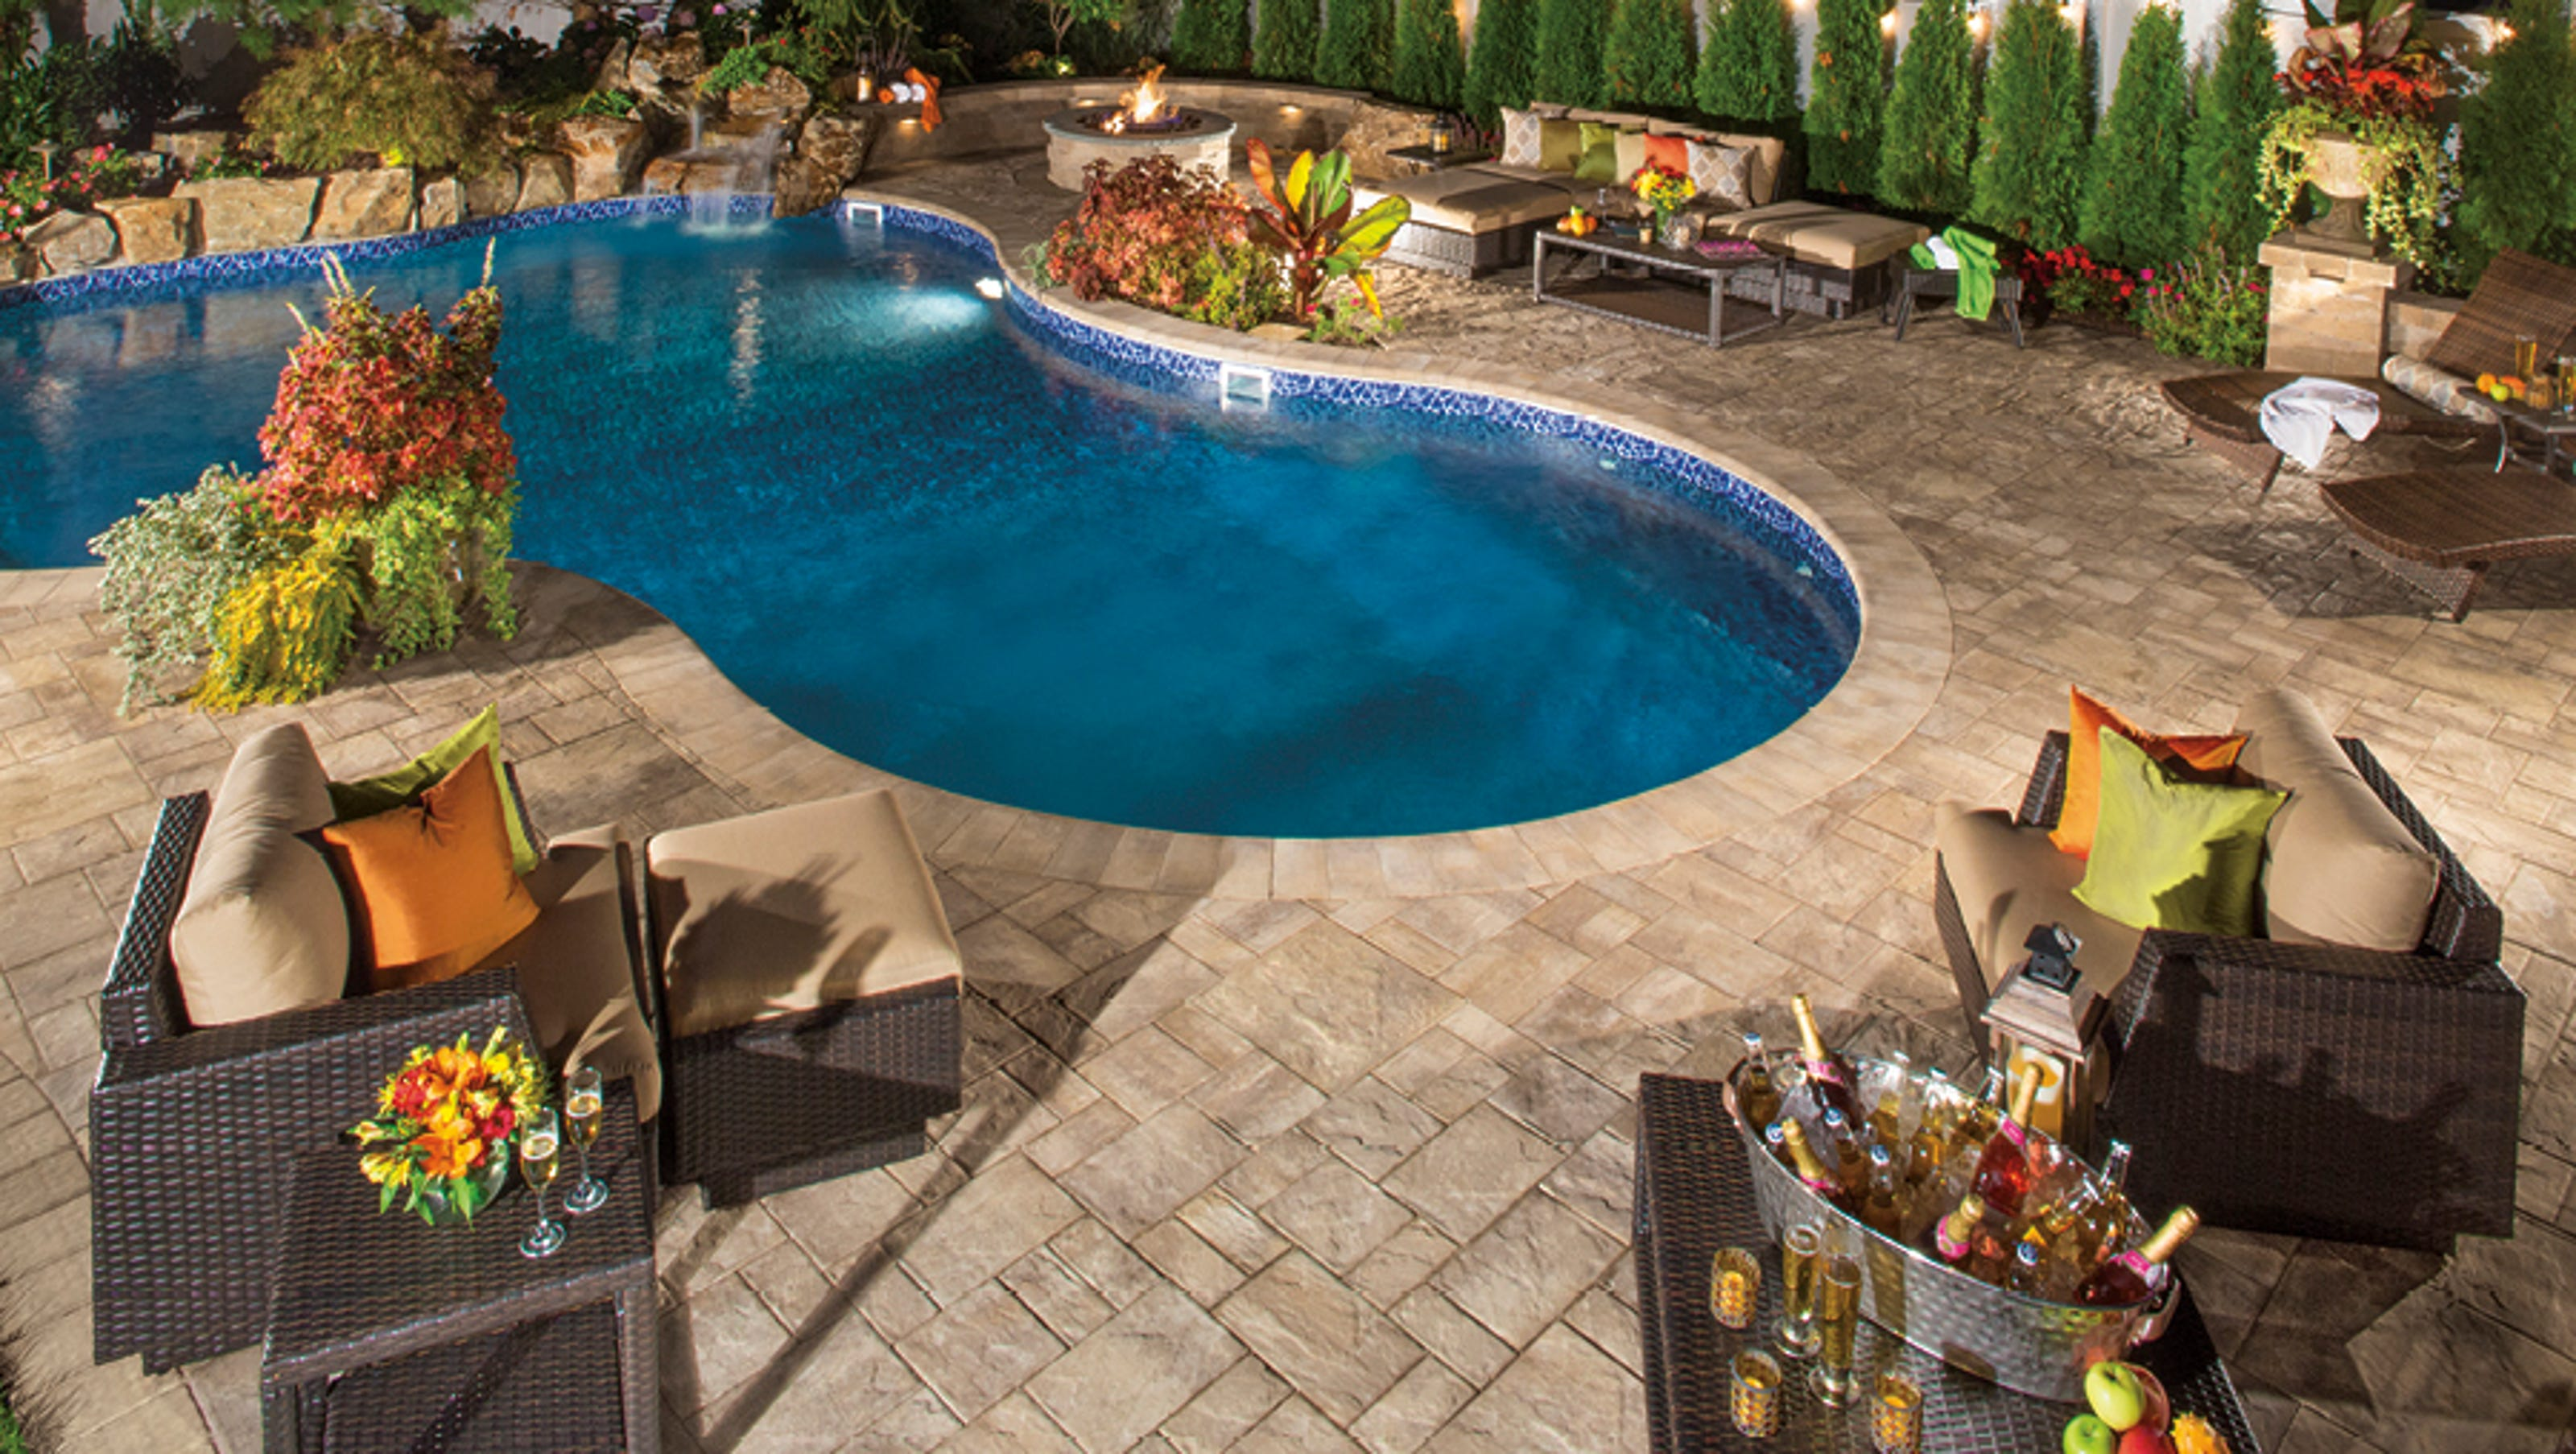 Create A Pool Getaway In Your Own Backyard